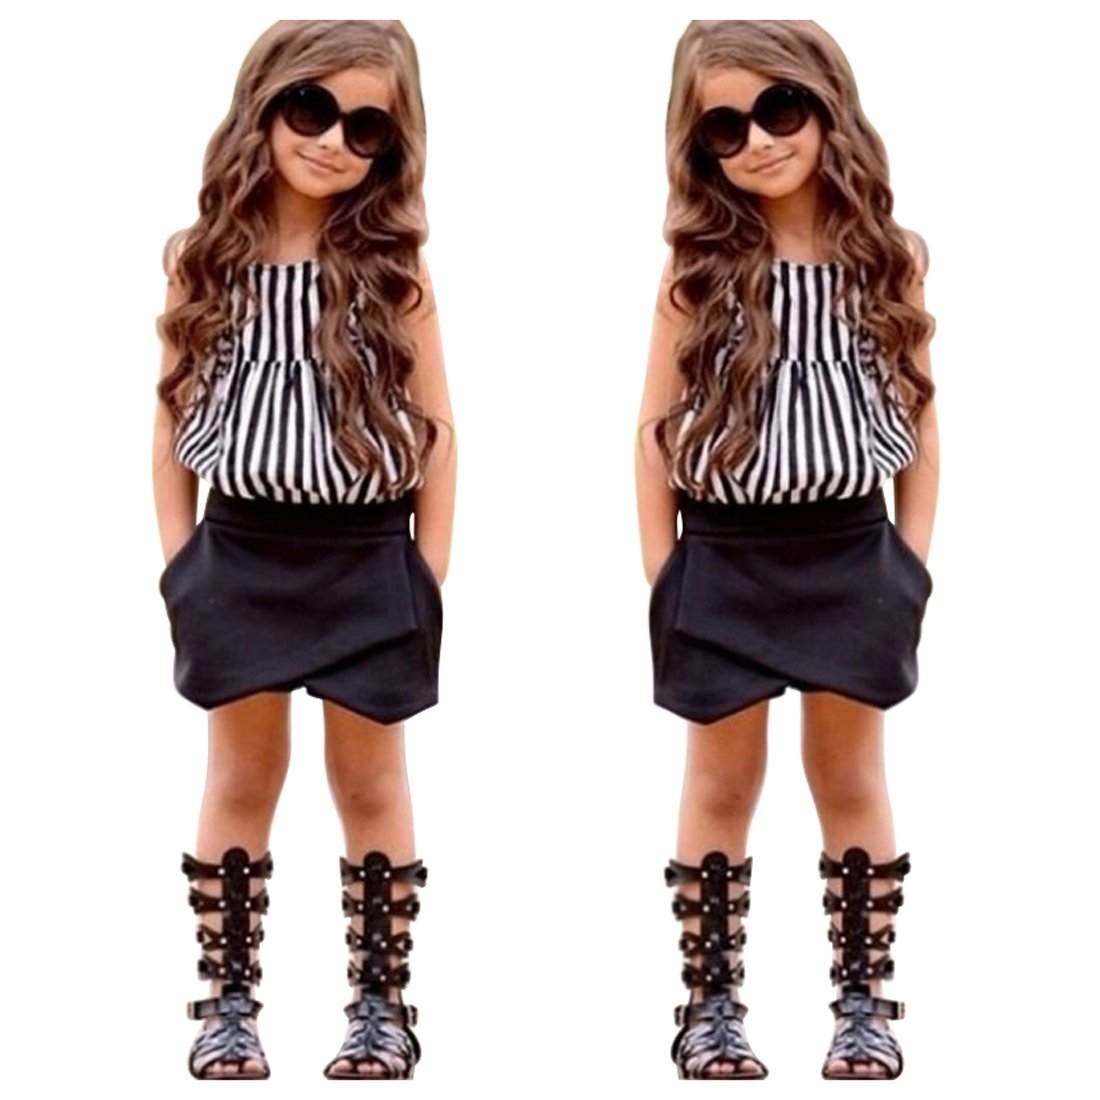 EITC Summer New Fashion Girls 2PCS Clothing Set: Striped Top+ Shorts 6T